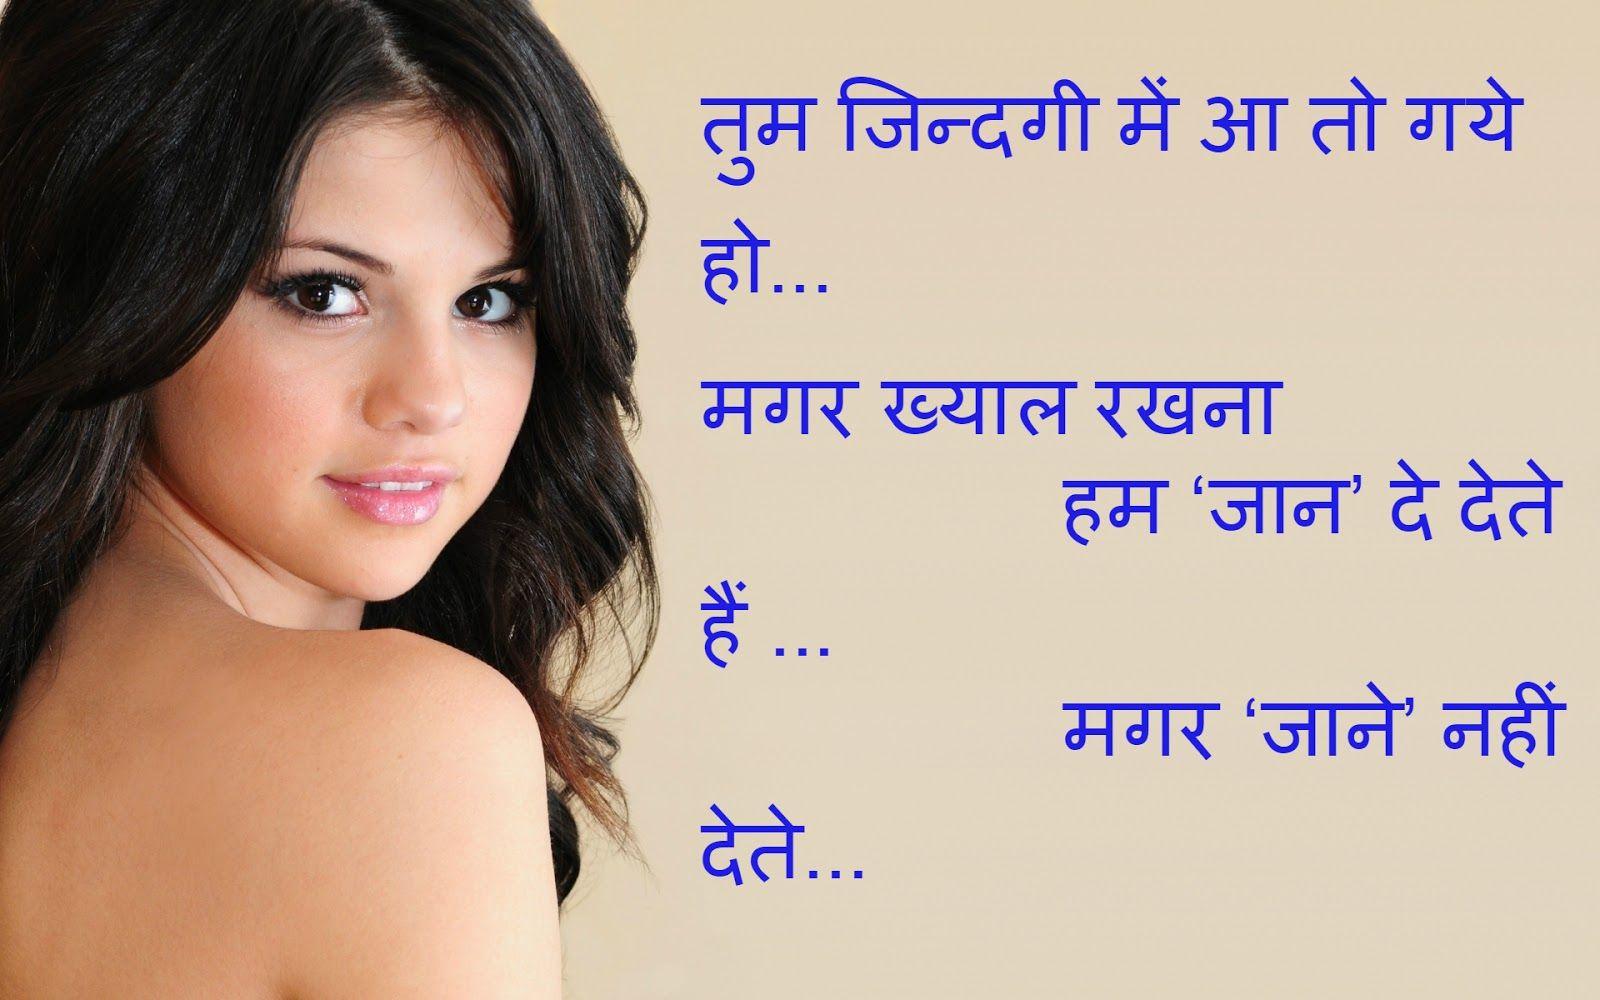 Pin On Image Downloads Love sad shayari hd wallpaper download